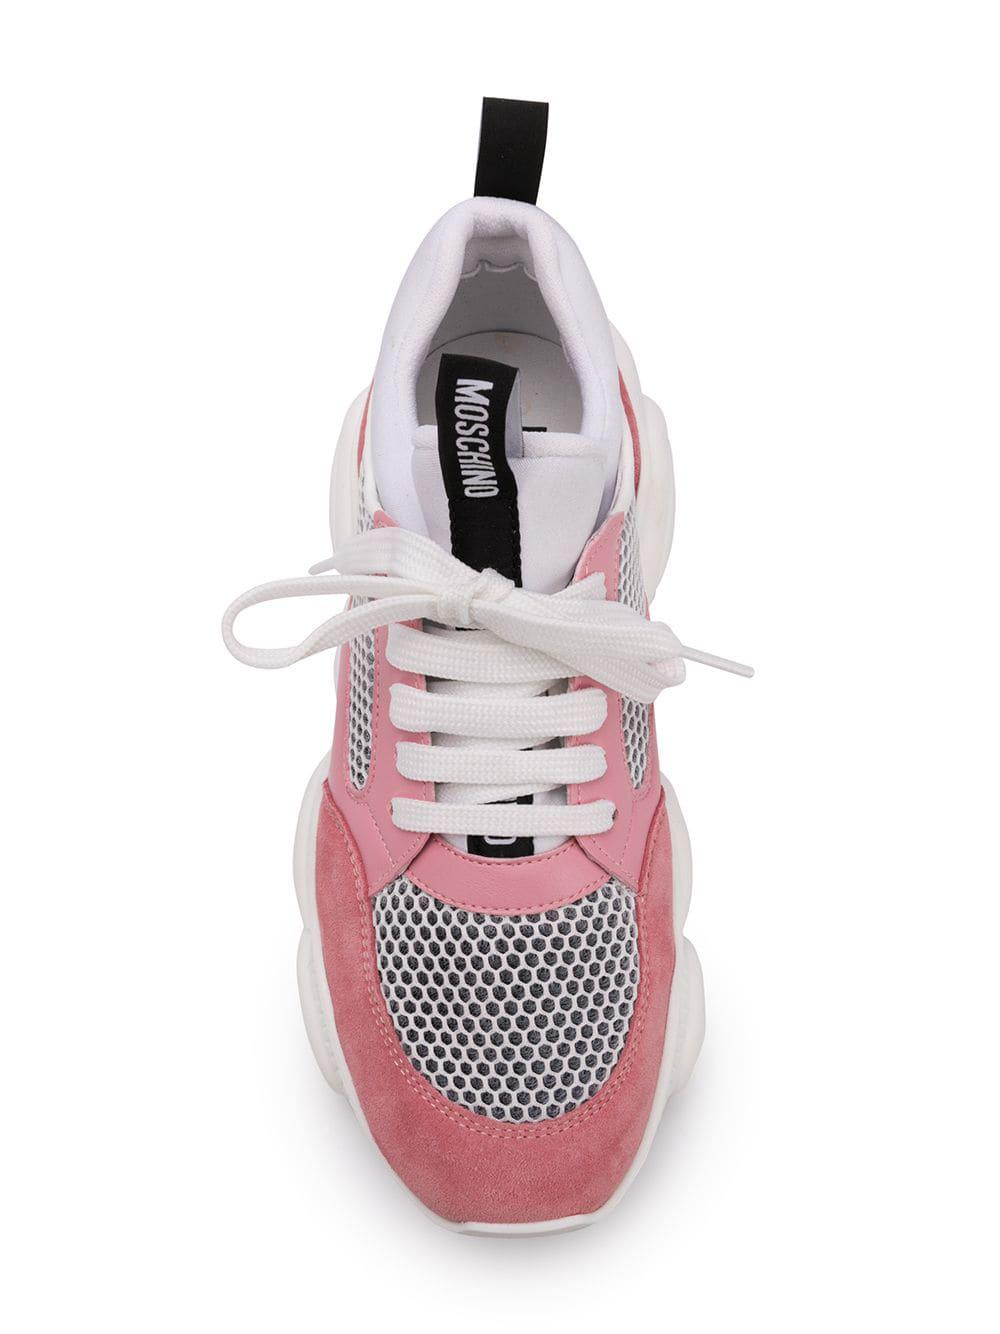 23f18e3daaf76 Moschino Teddy Run Sneakers in Pink - Lyst